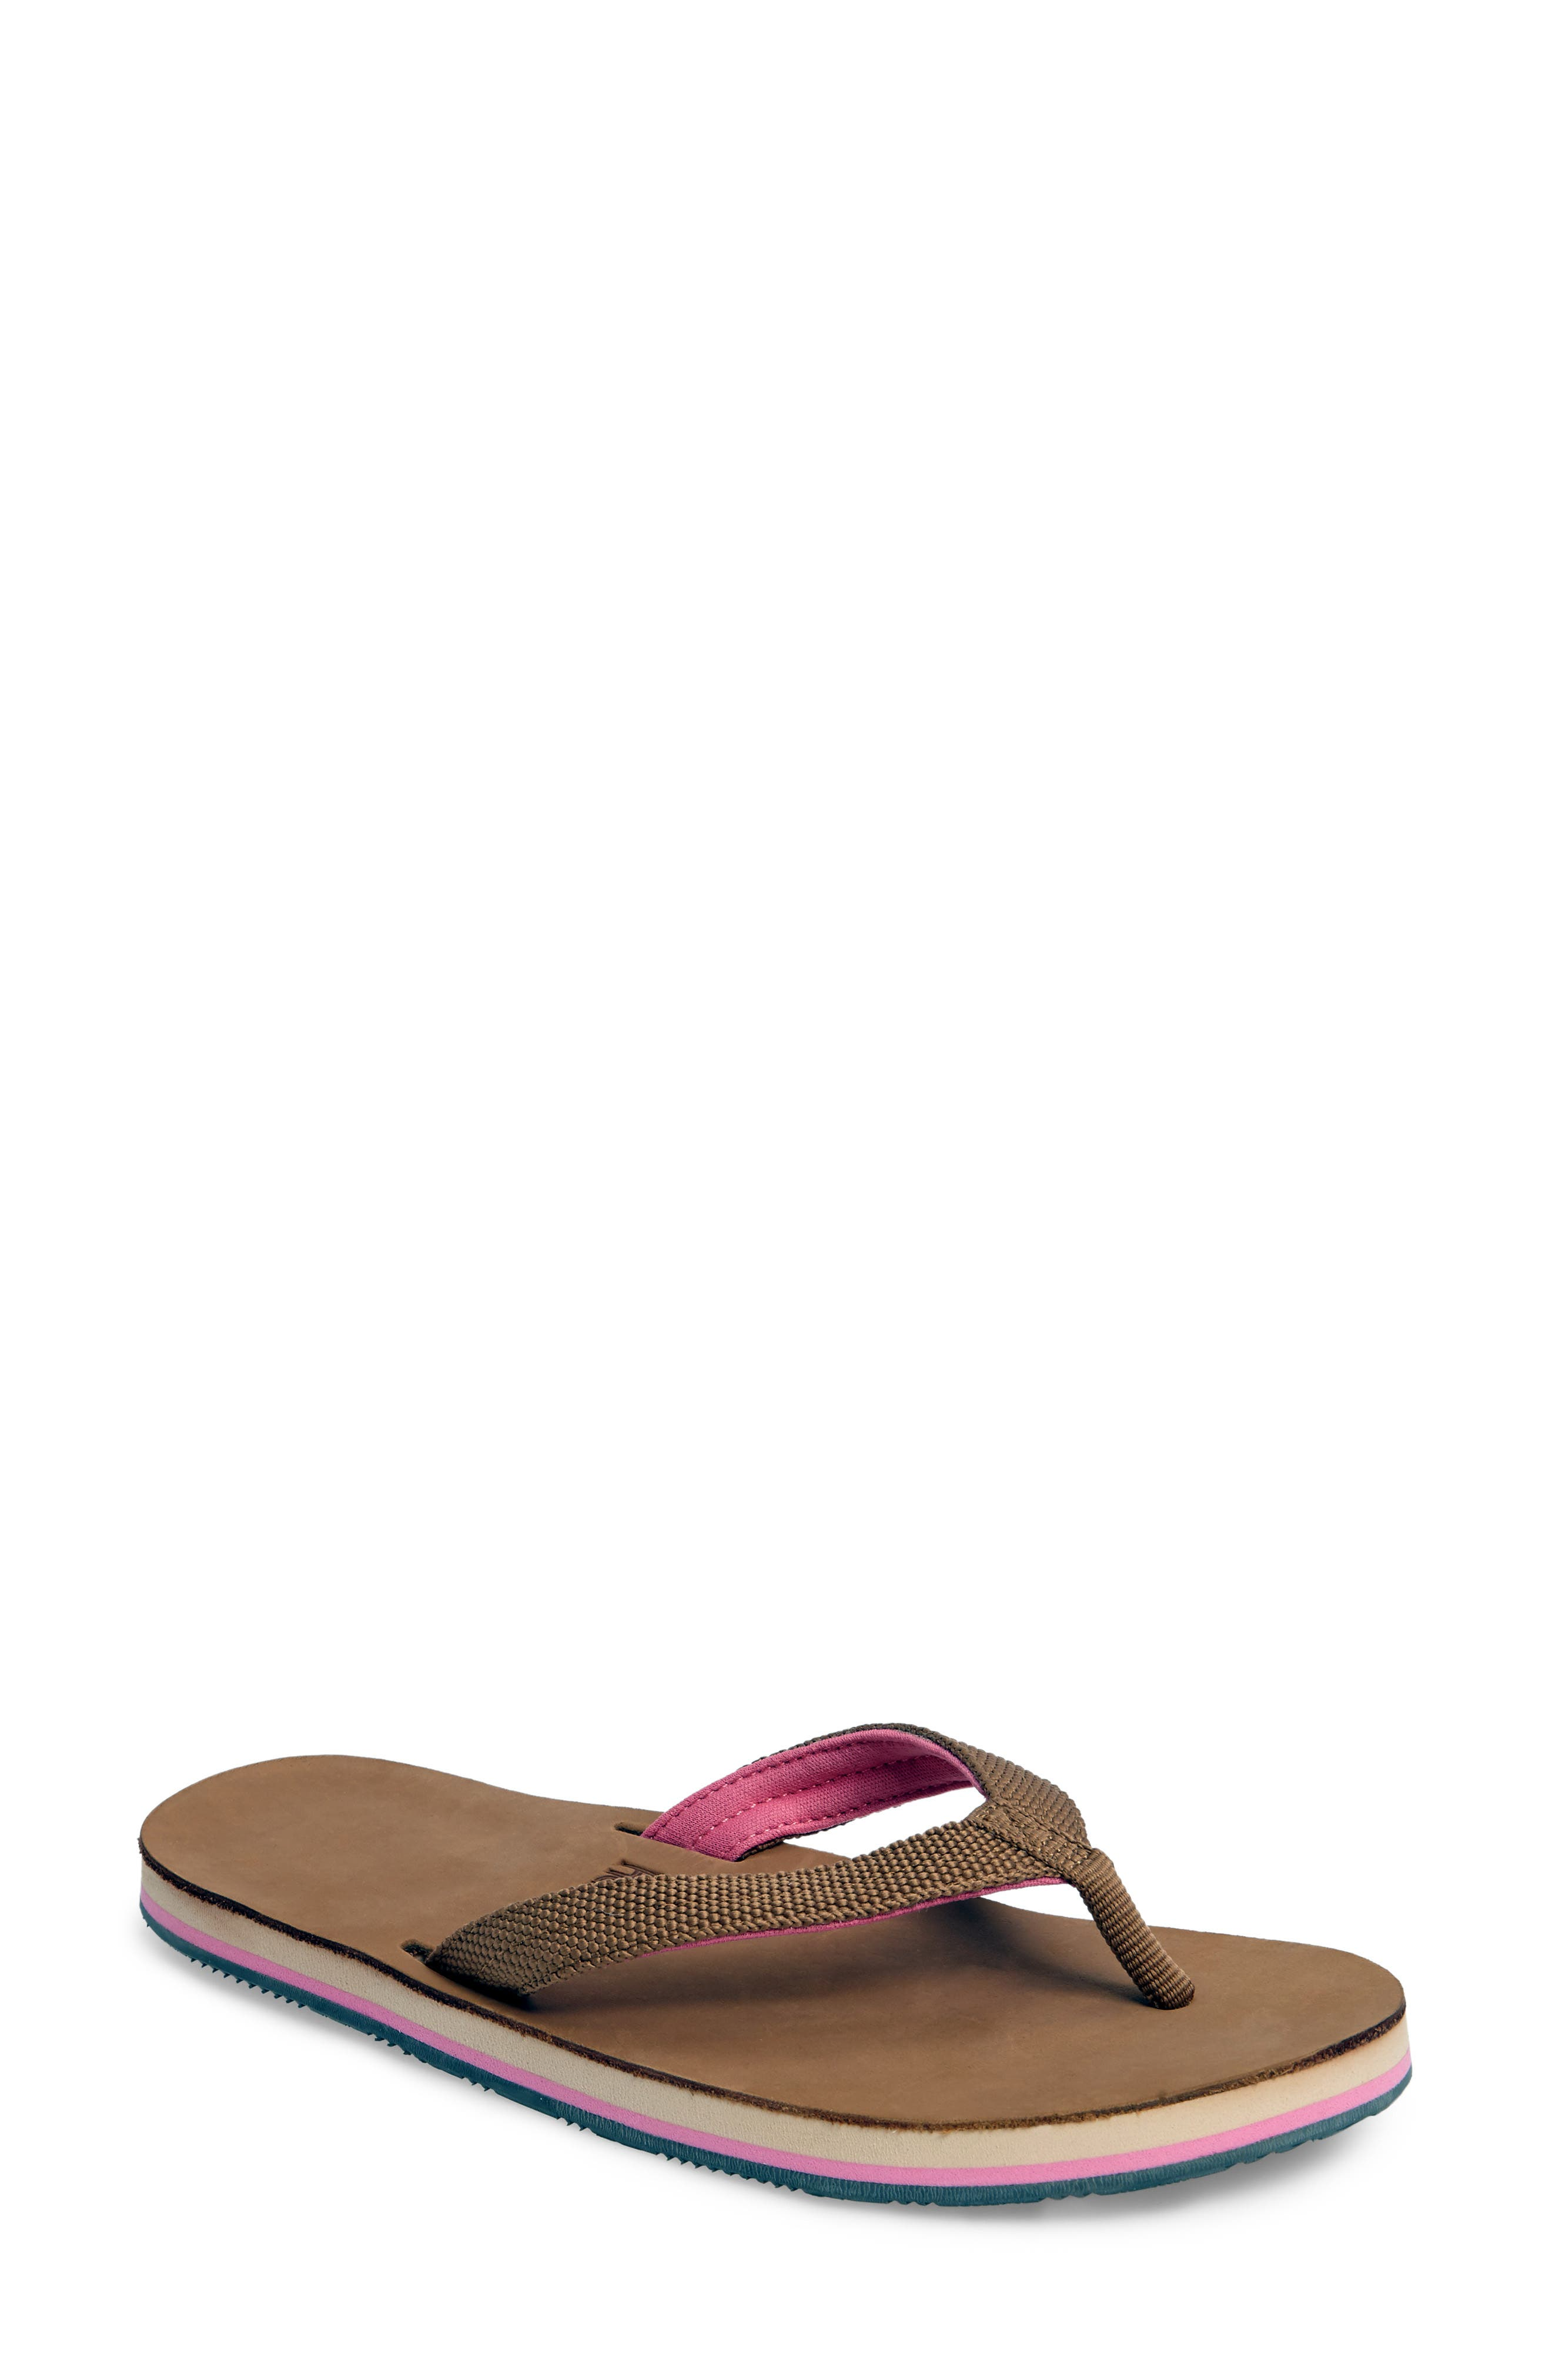 Scouts Flip Flop,                         Main,                         color, Tan/ Shell Pink